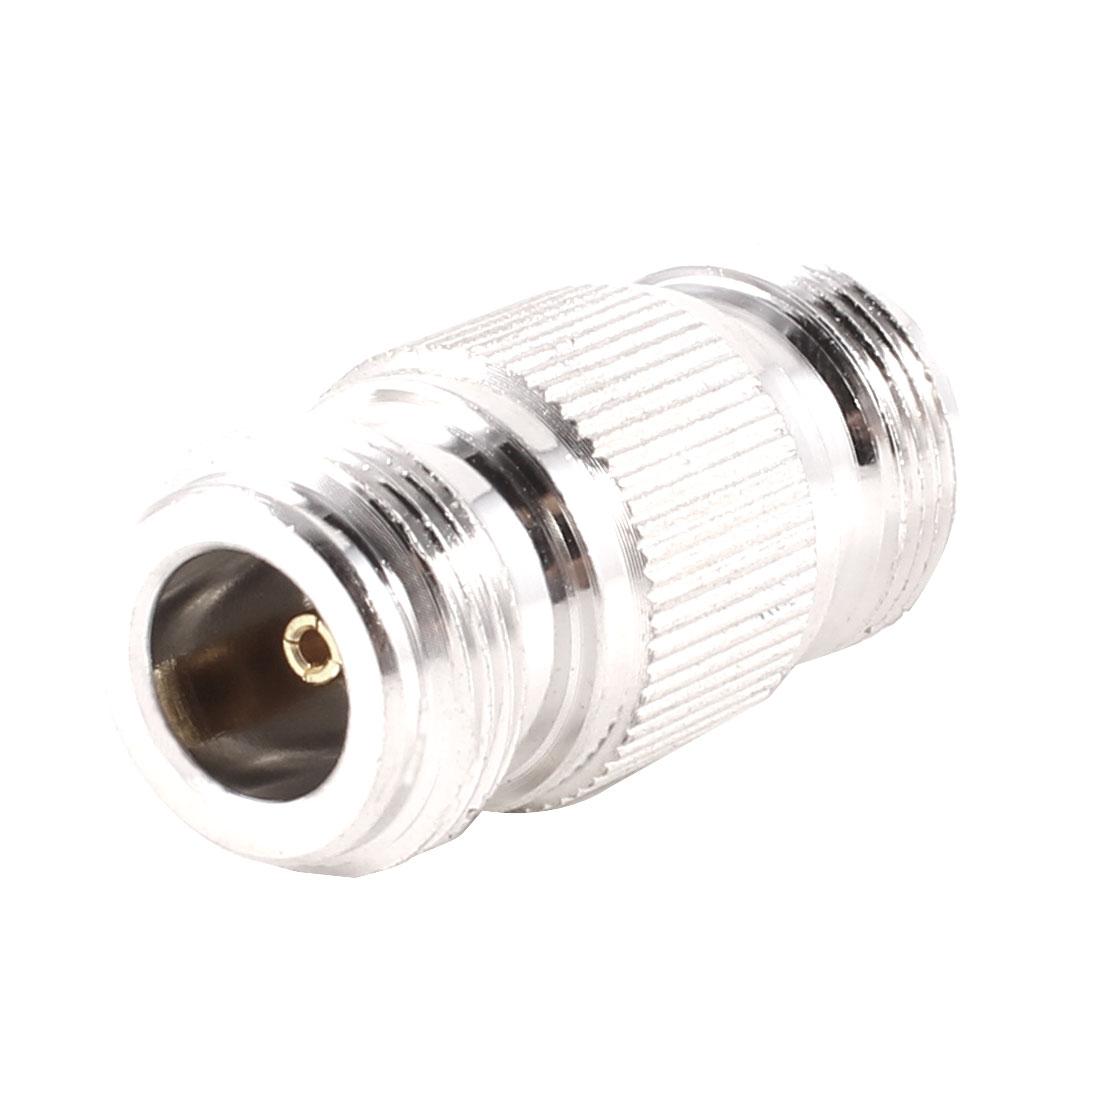 Silver Tone N Female Jack to N Female Plug RF Coaxial Connectors